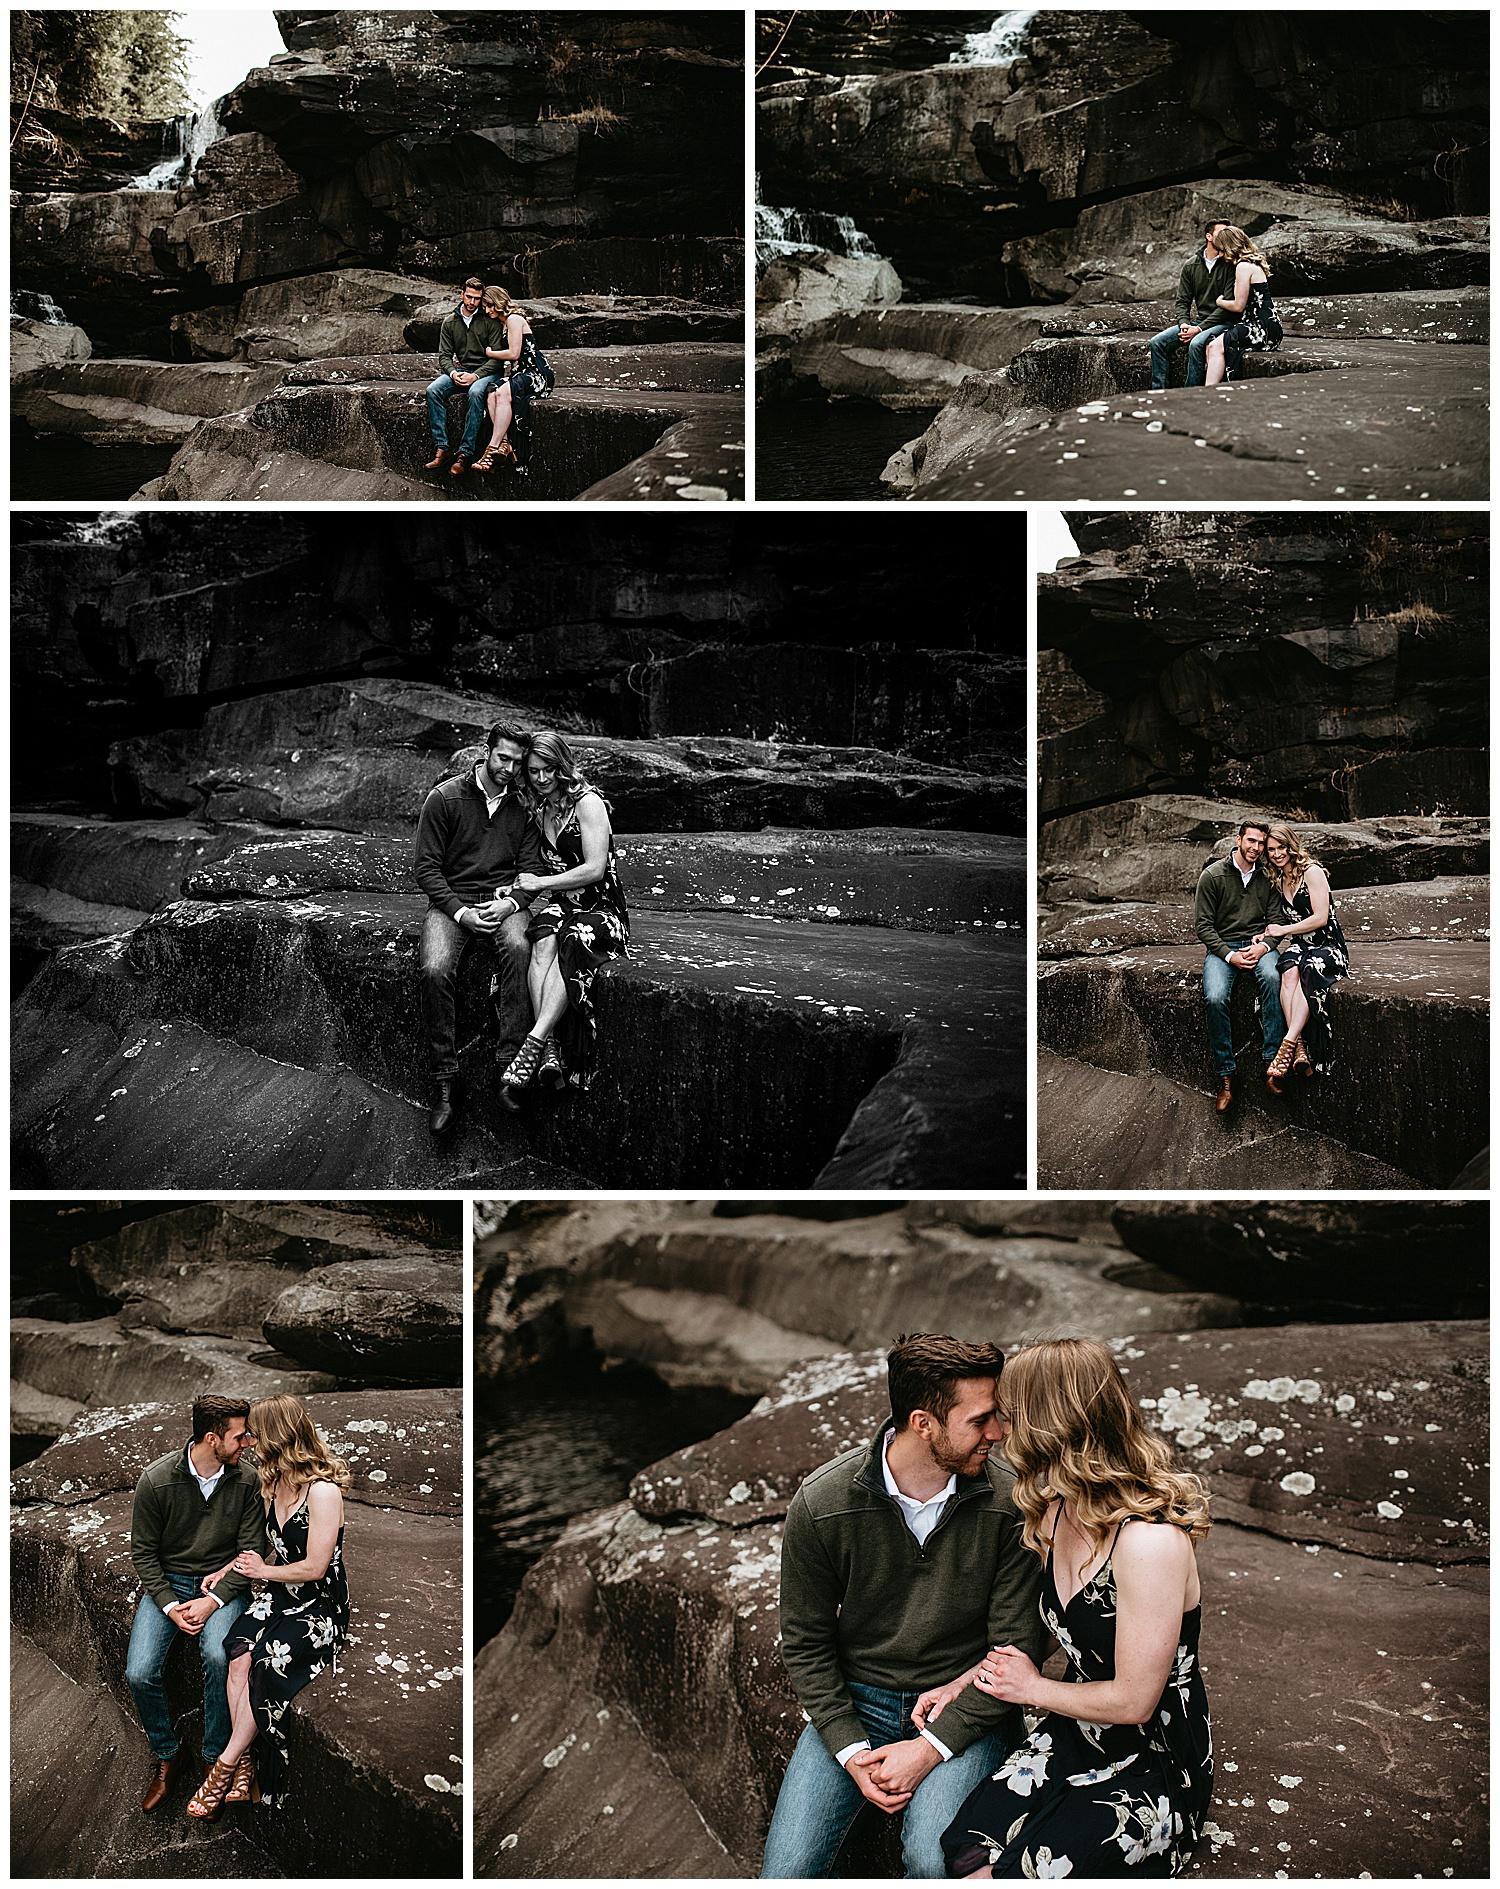 NEPA-Lehigh-Valley-Wedding-Photographer-Ledges-Hotel-Hawley-PA_0003.jpg